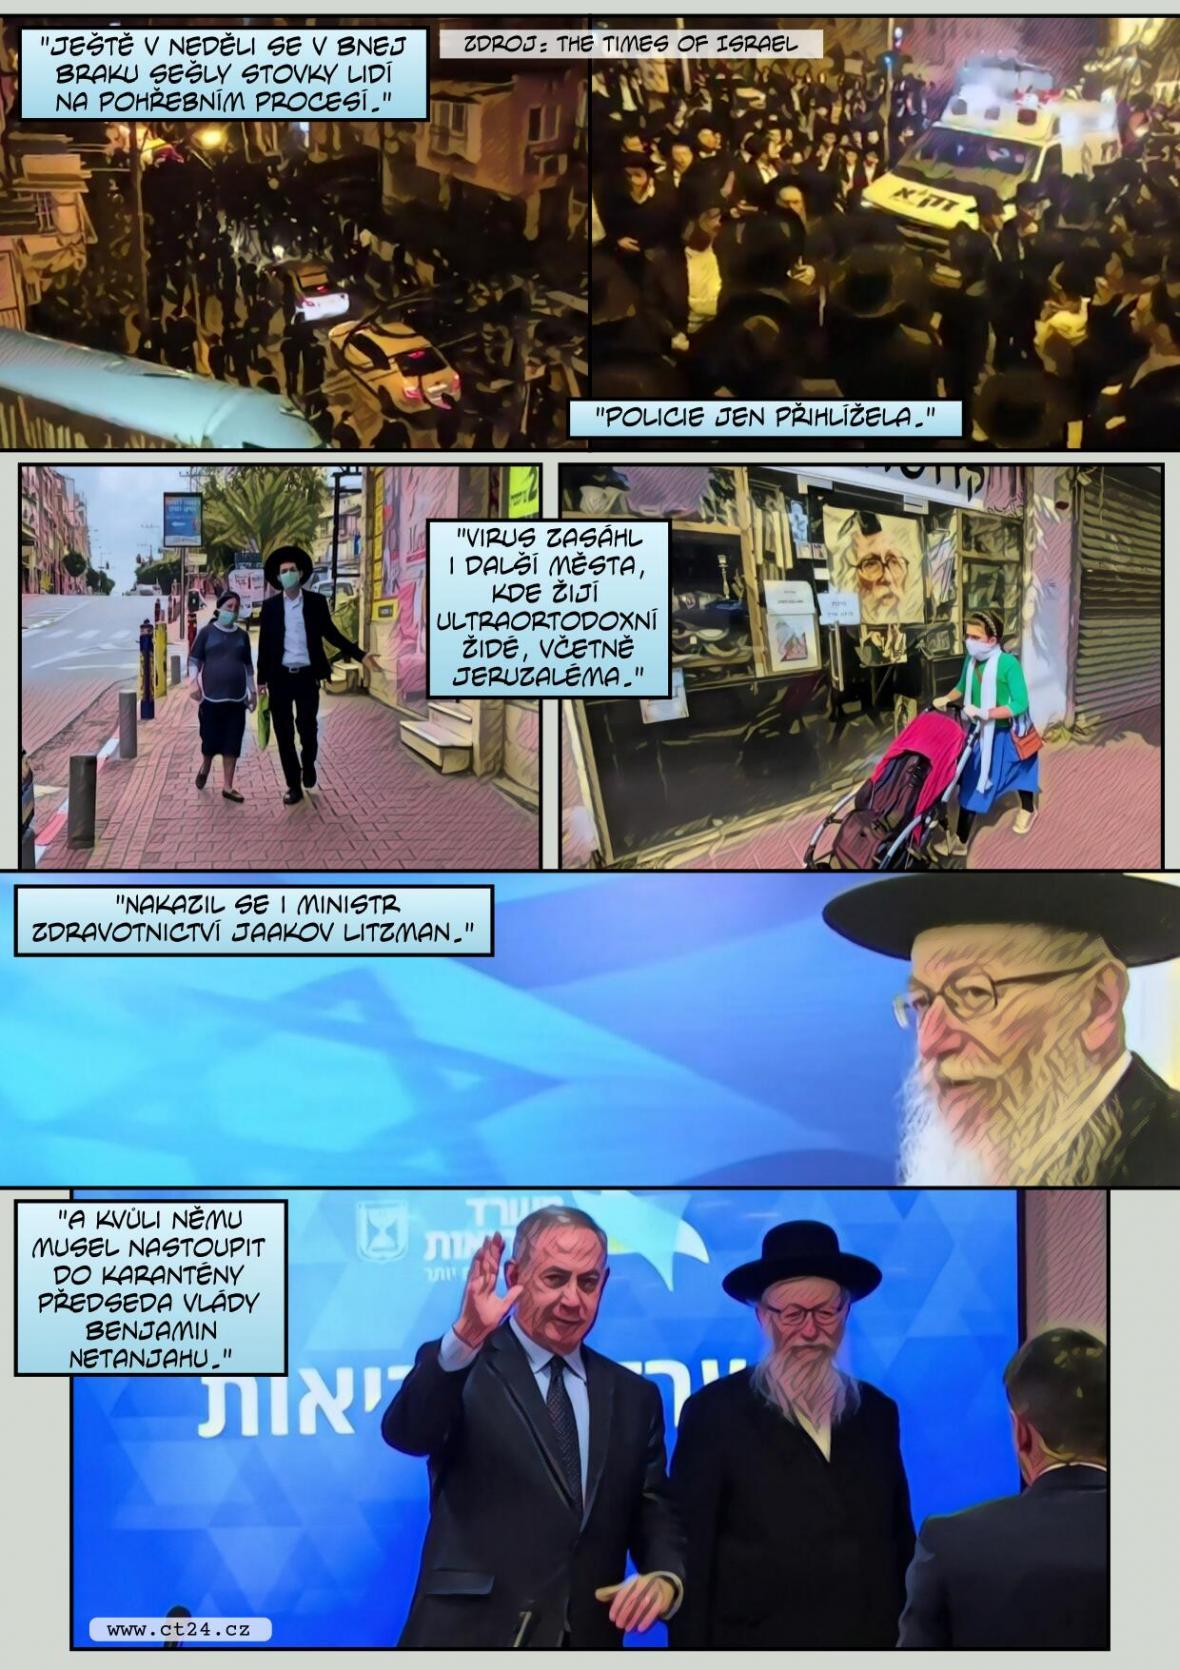 Nikdo dovnitř, nikdo ven. Izrael kompletně uzavřela město Bnej Brak